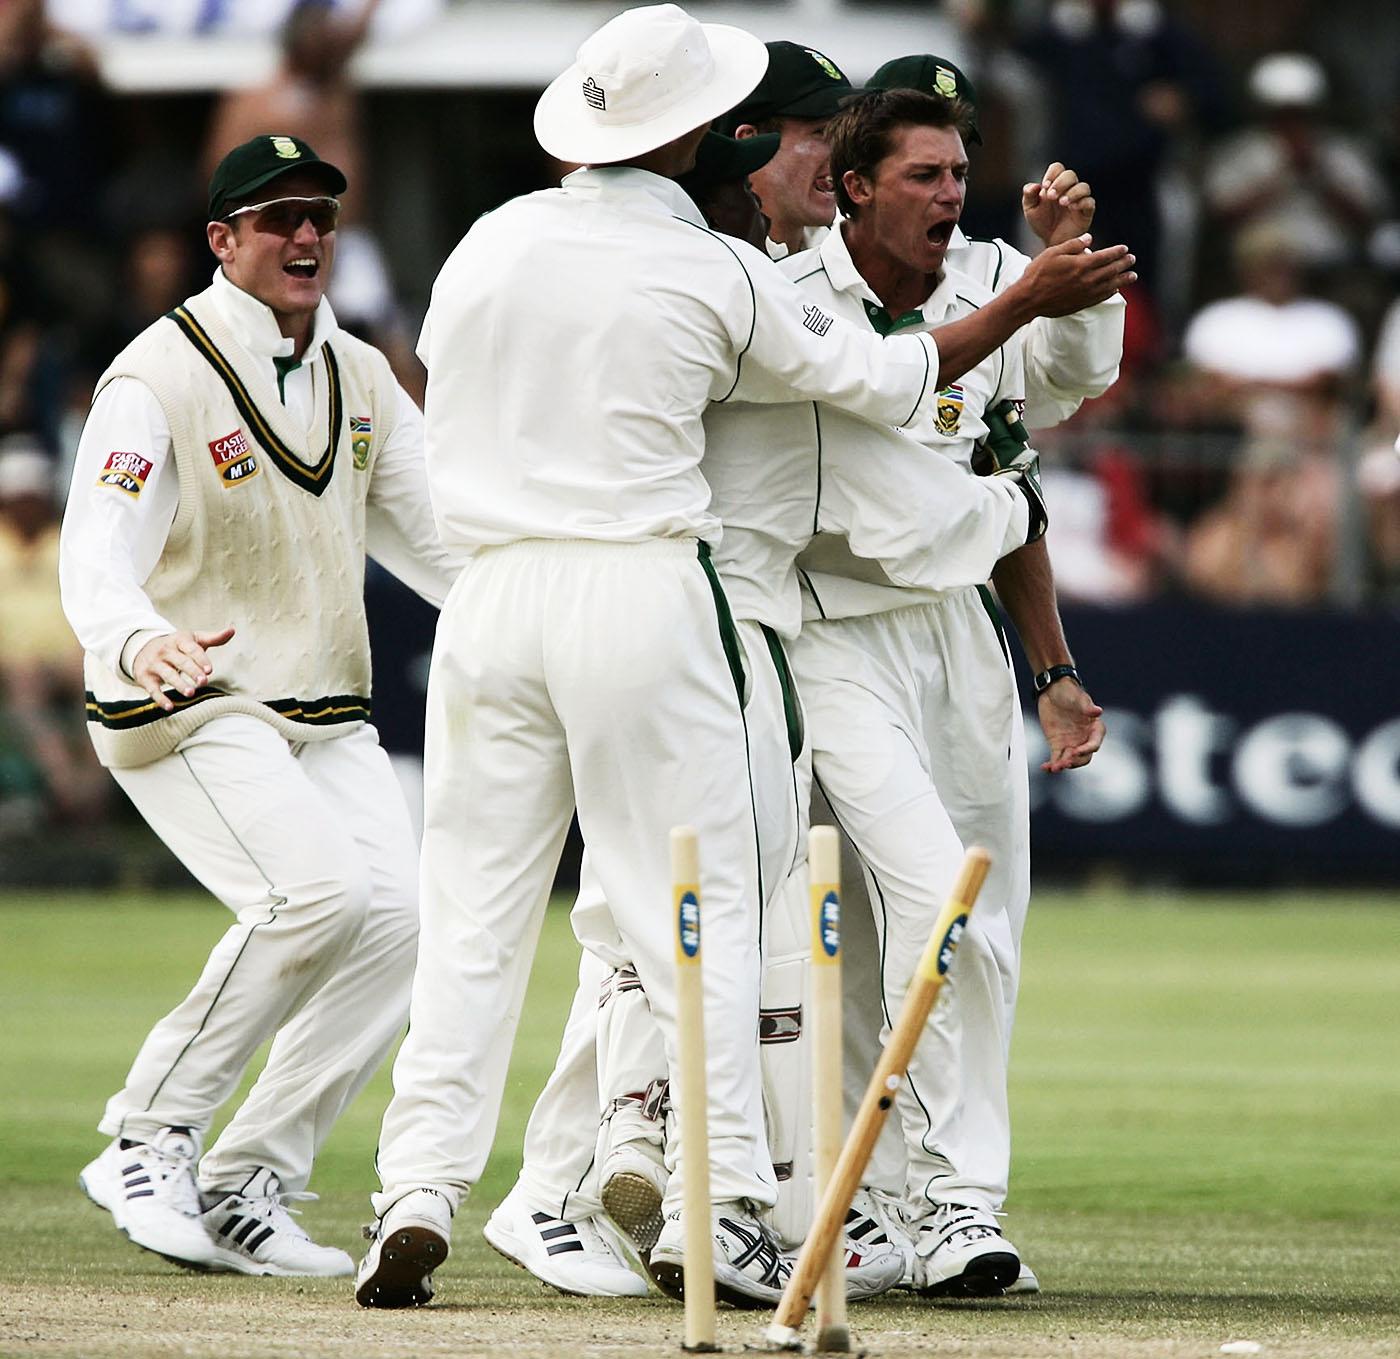 Dale Steyn celebrates his first Test wicket